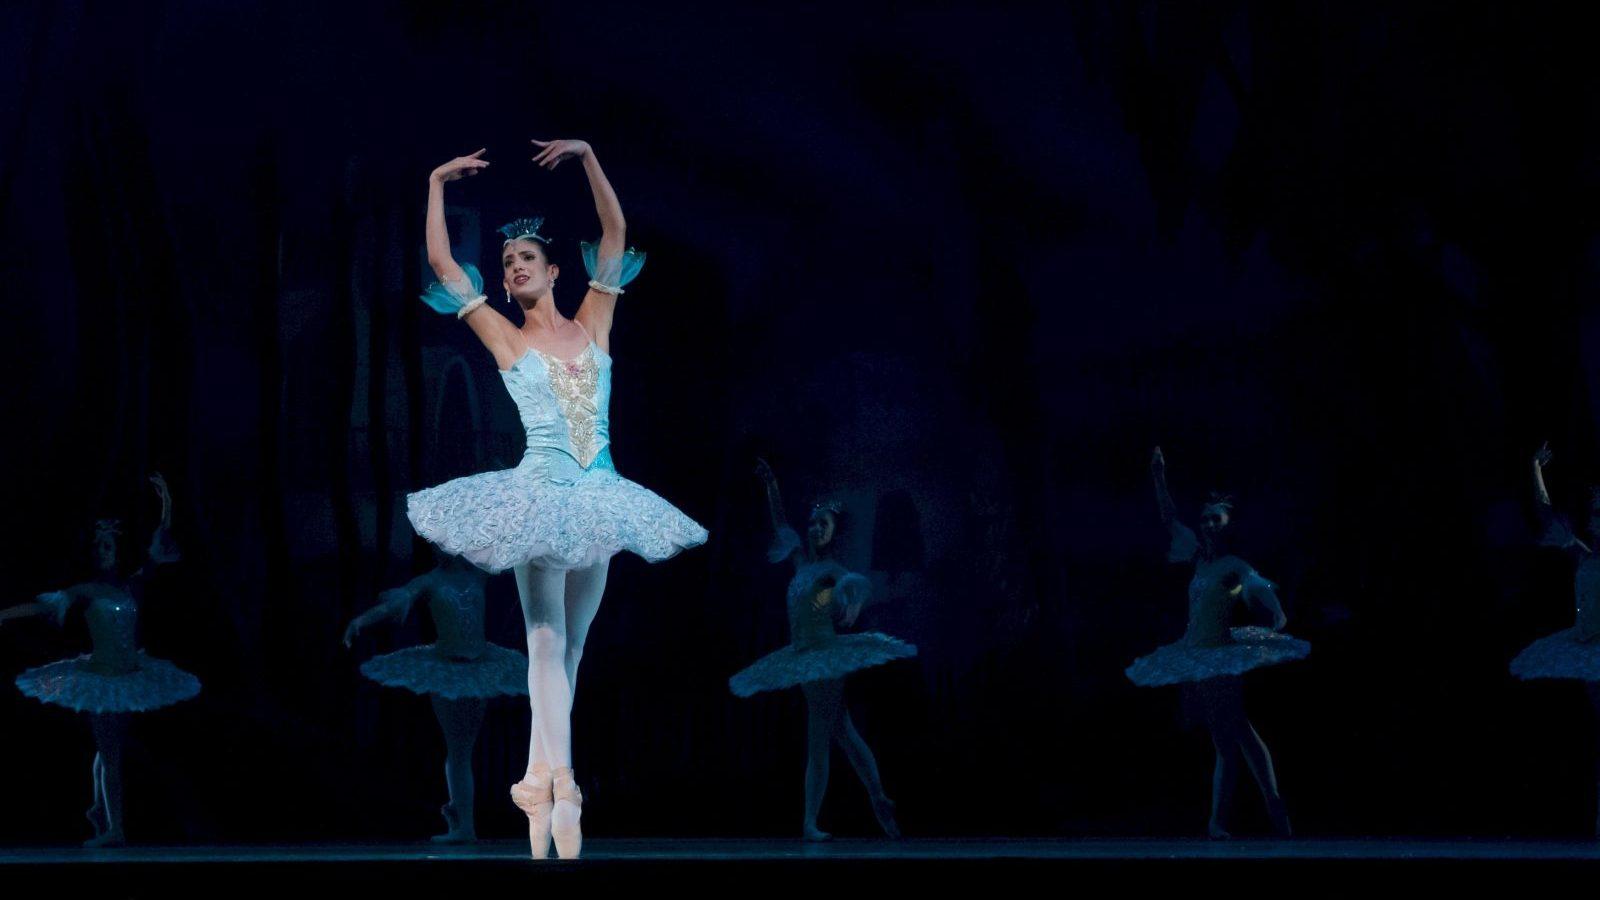 balance-ballerina-ballet-46158-1x2cd8y